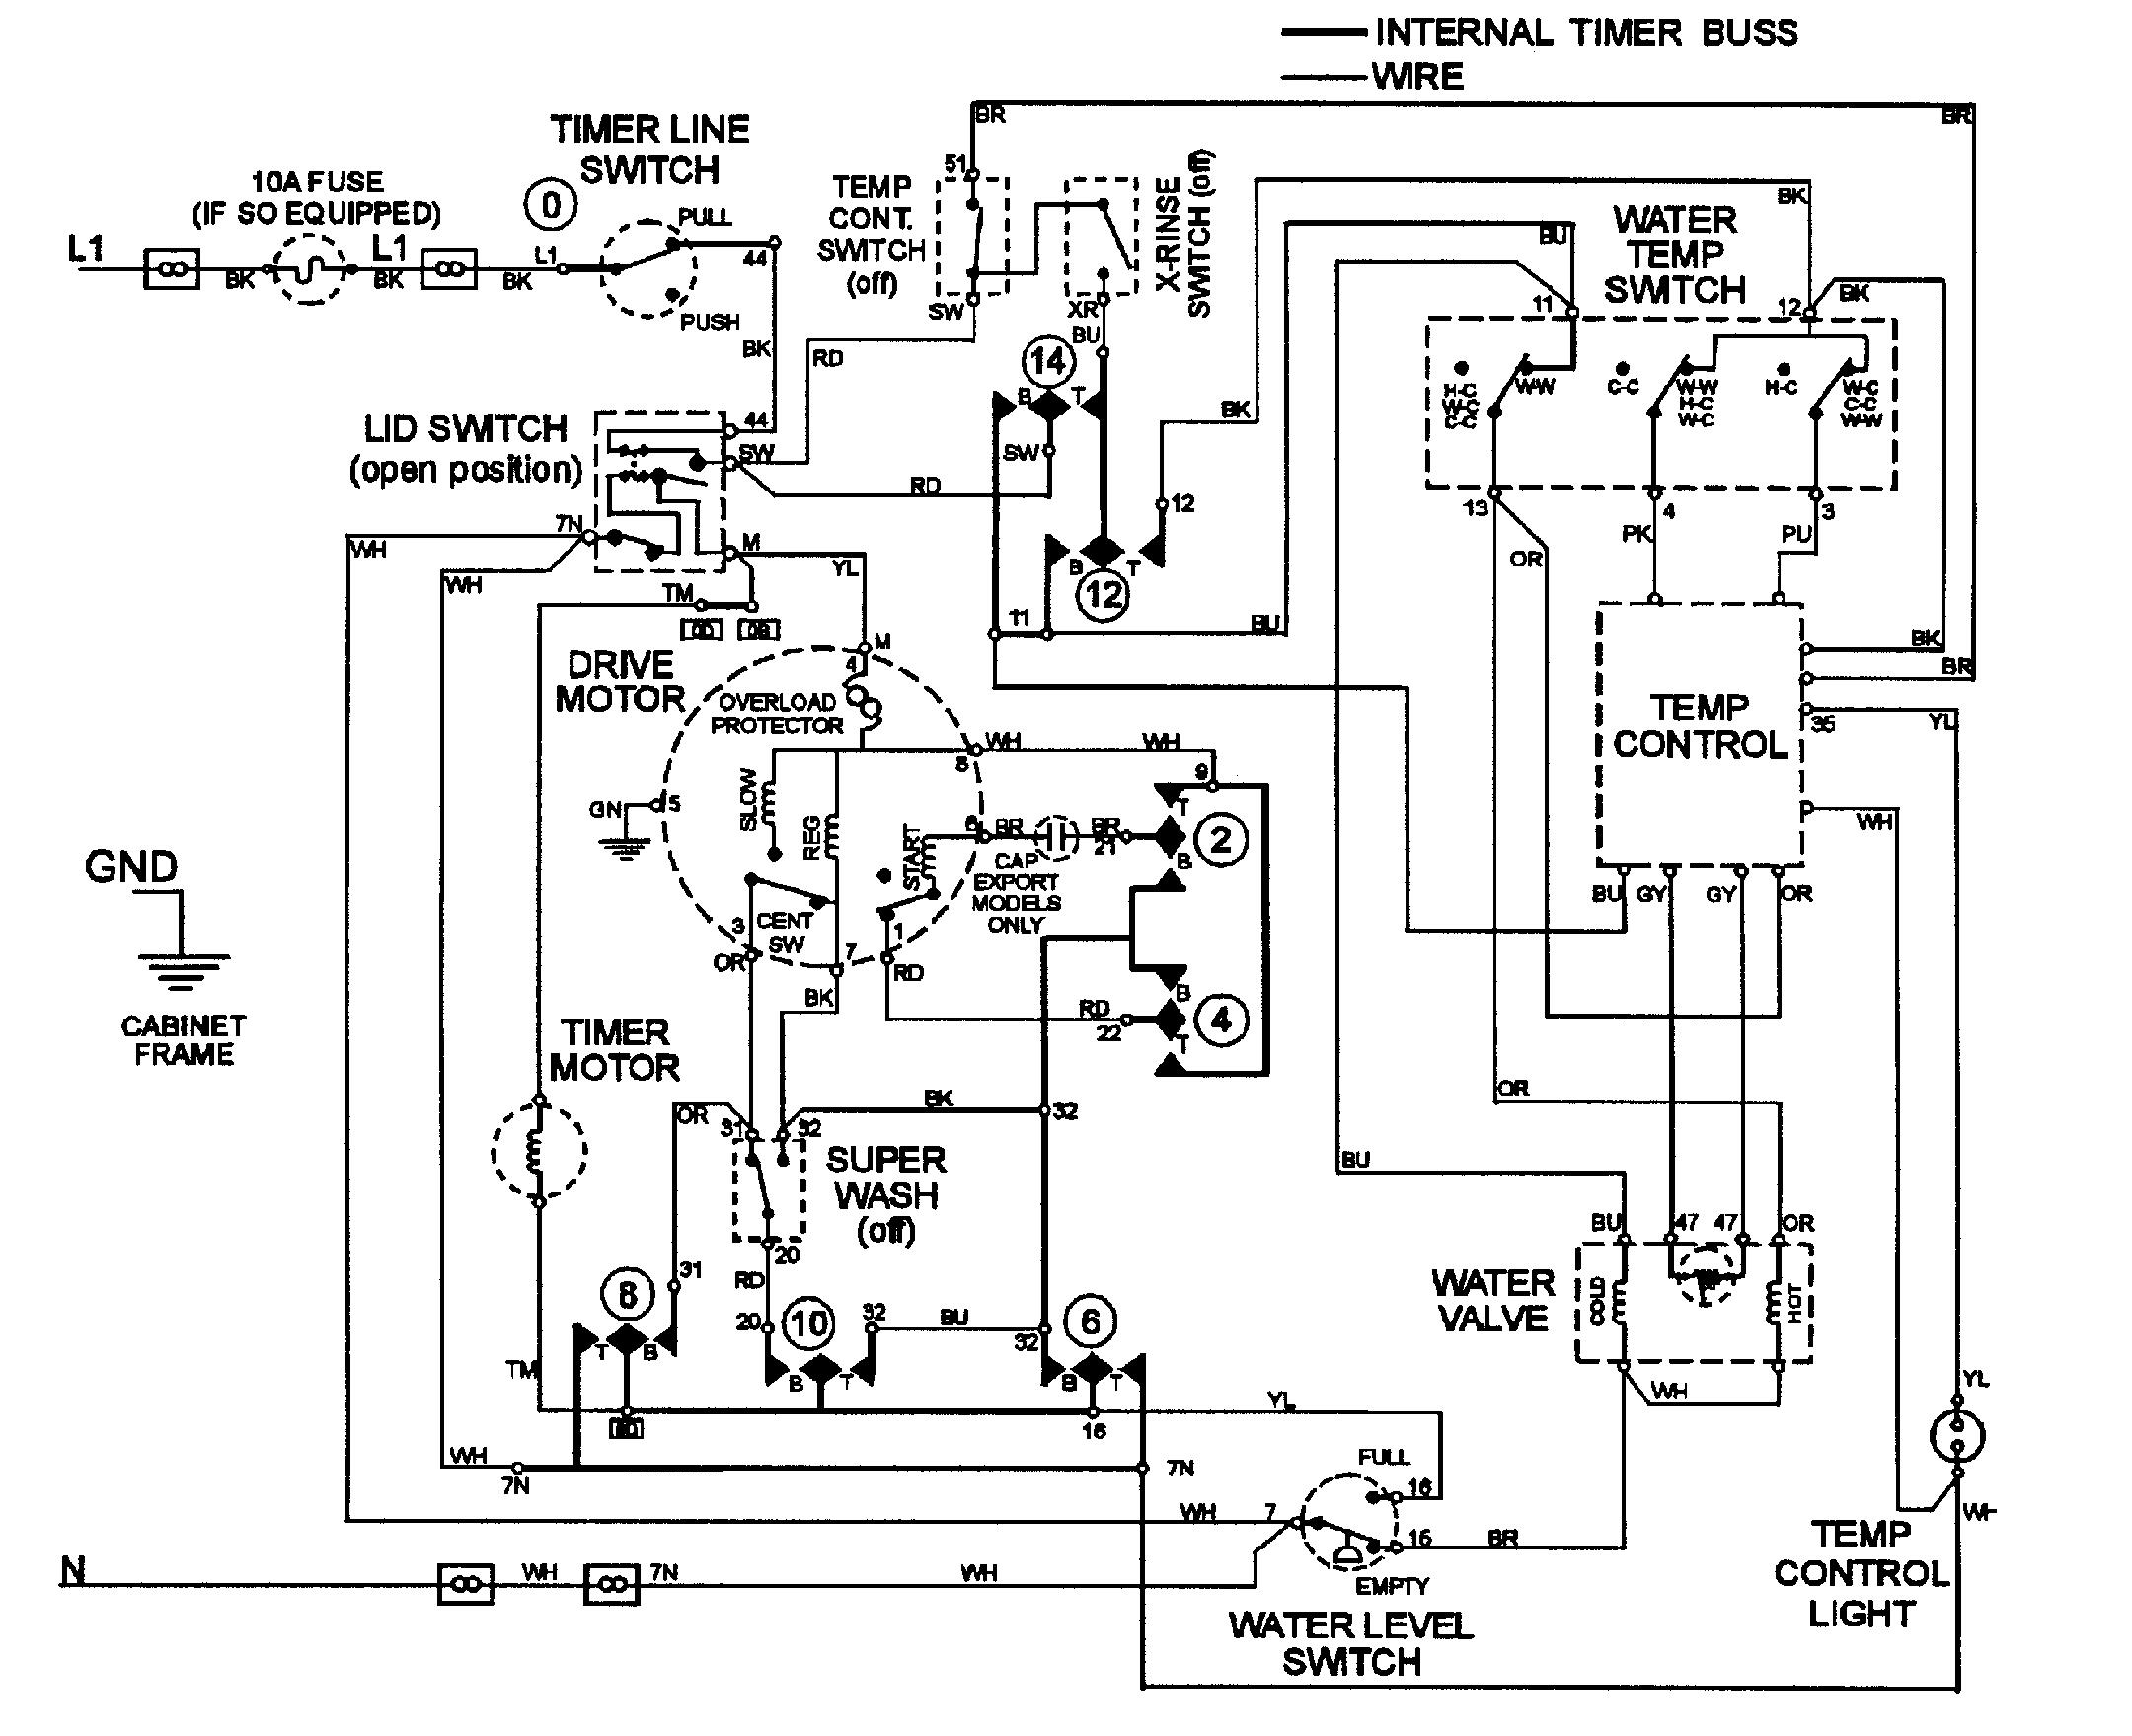 Kelvinator Washing Machine Wiring Diagram Auto Electrical Toyota Tarago Fuse Box Location Maytag